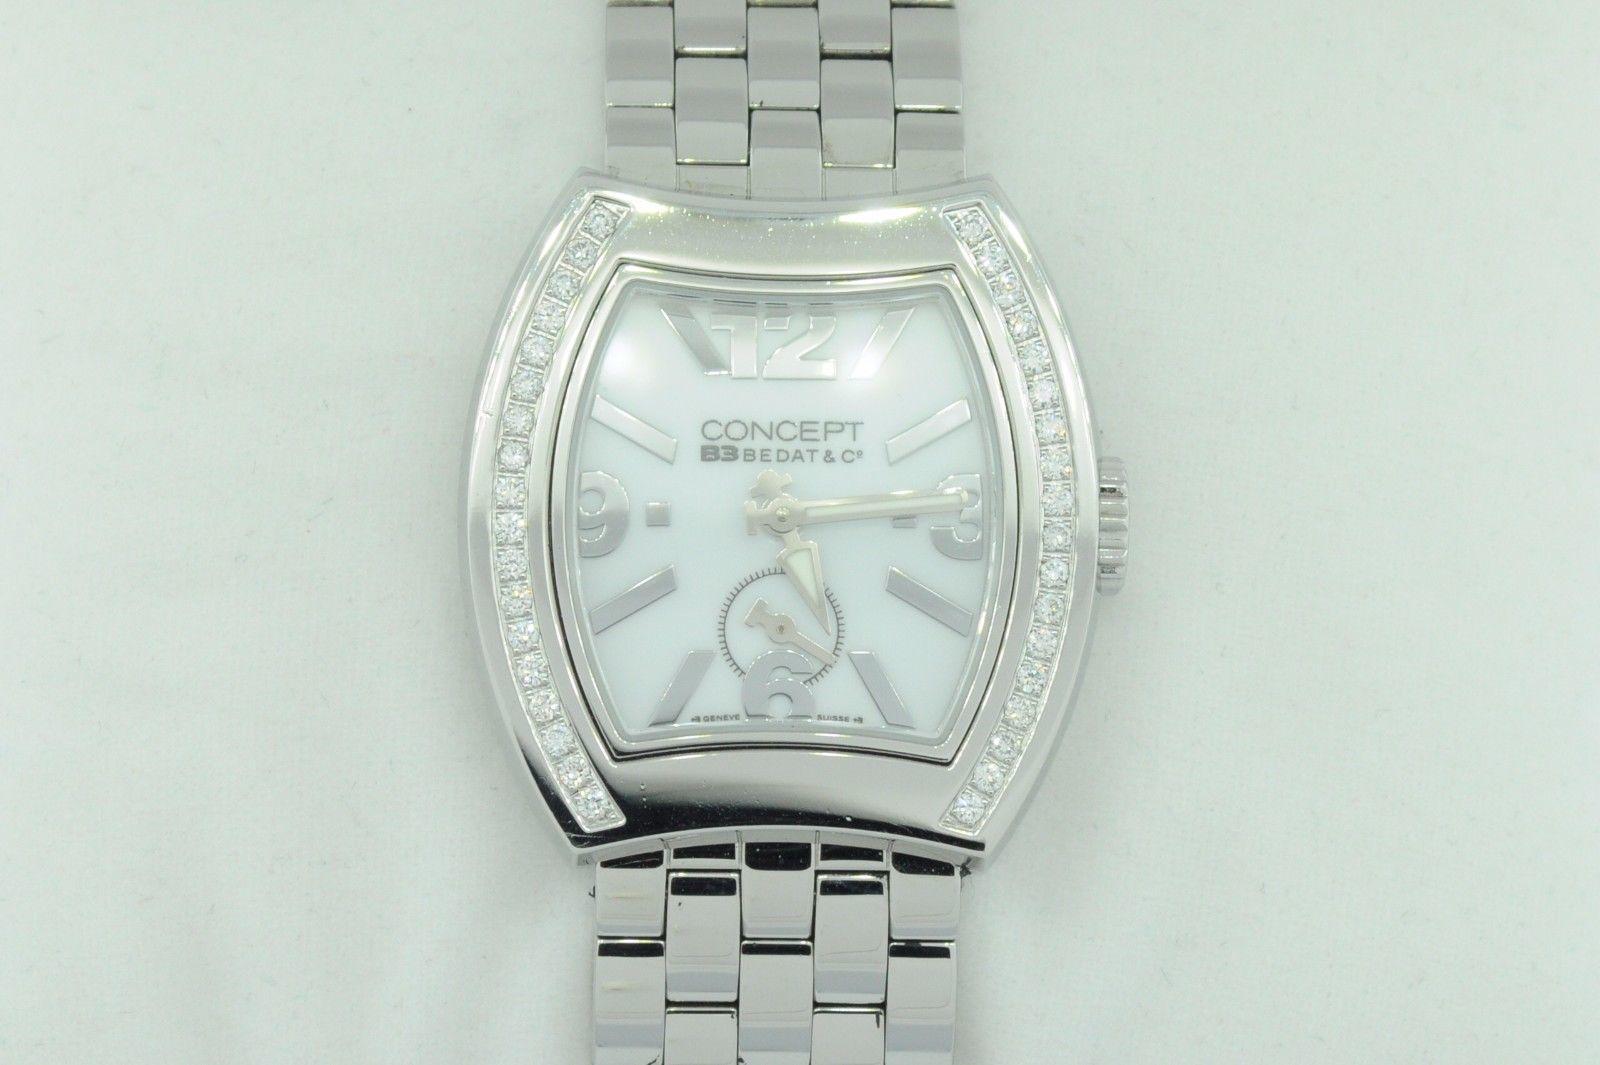 CONCEPT B3 Bedat & Co. Ladies Watch With Diamonds